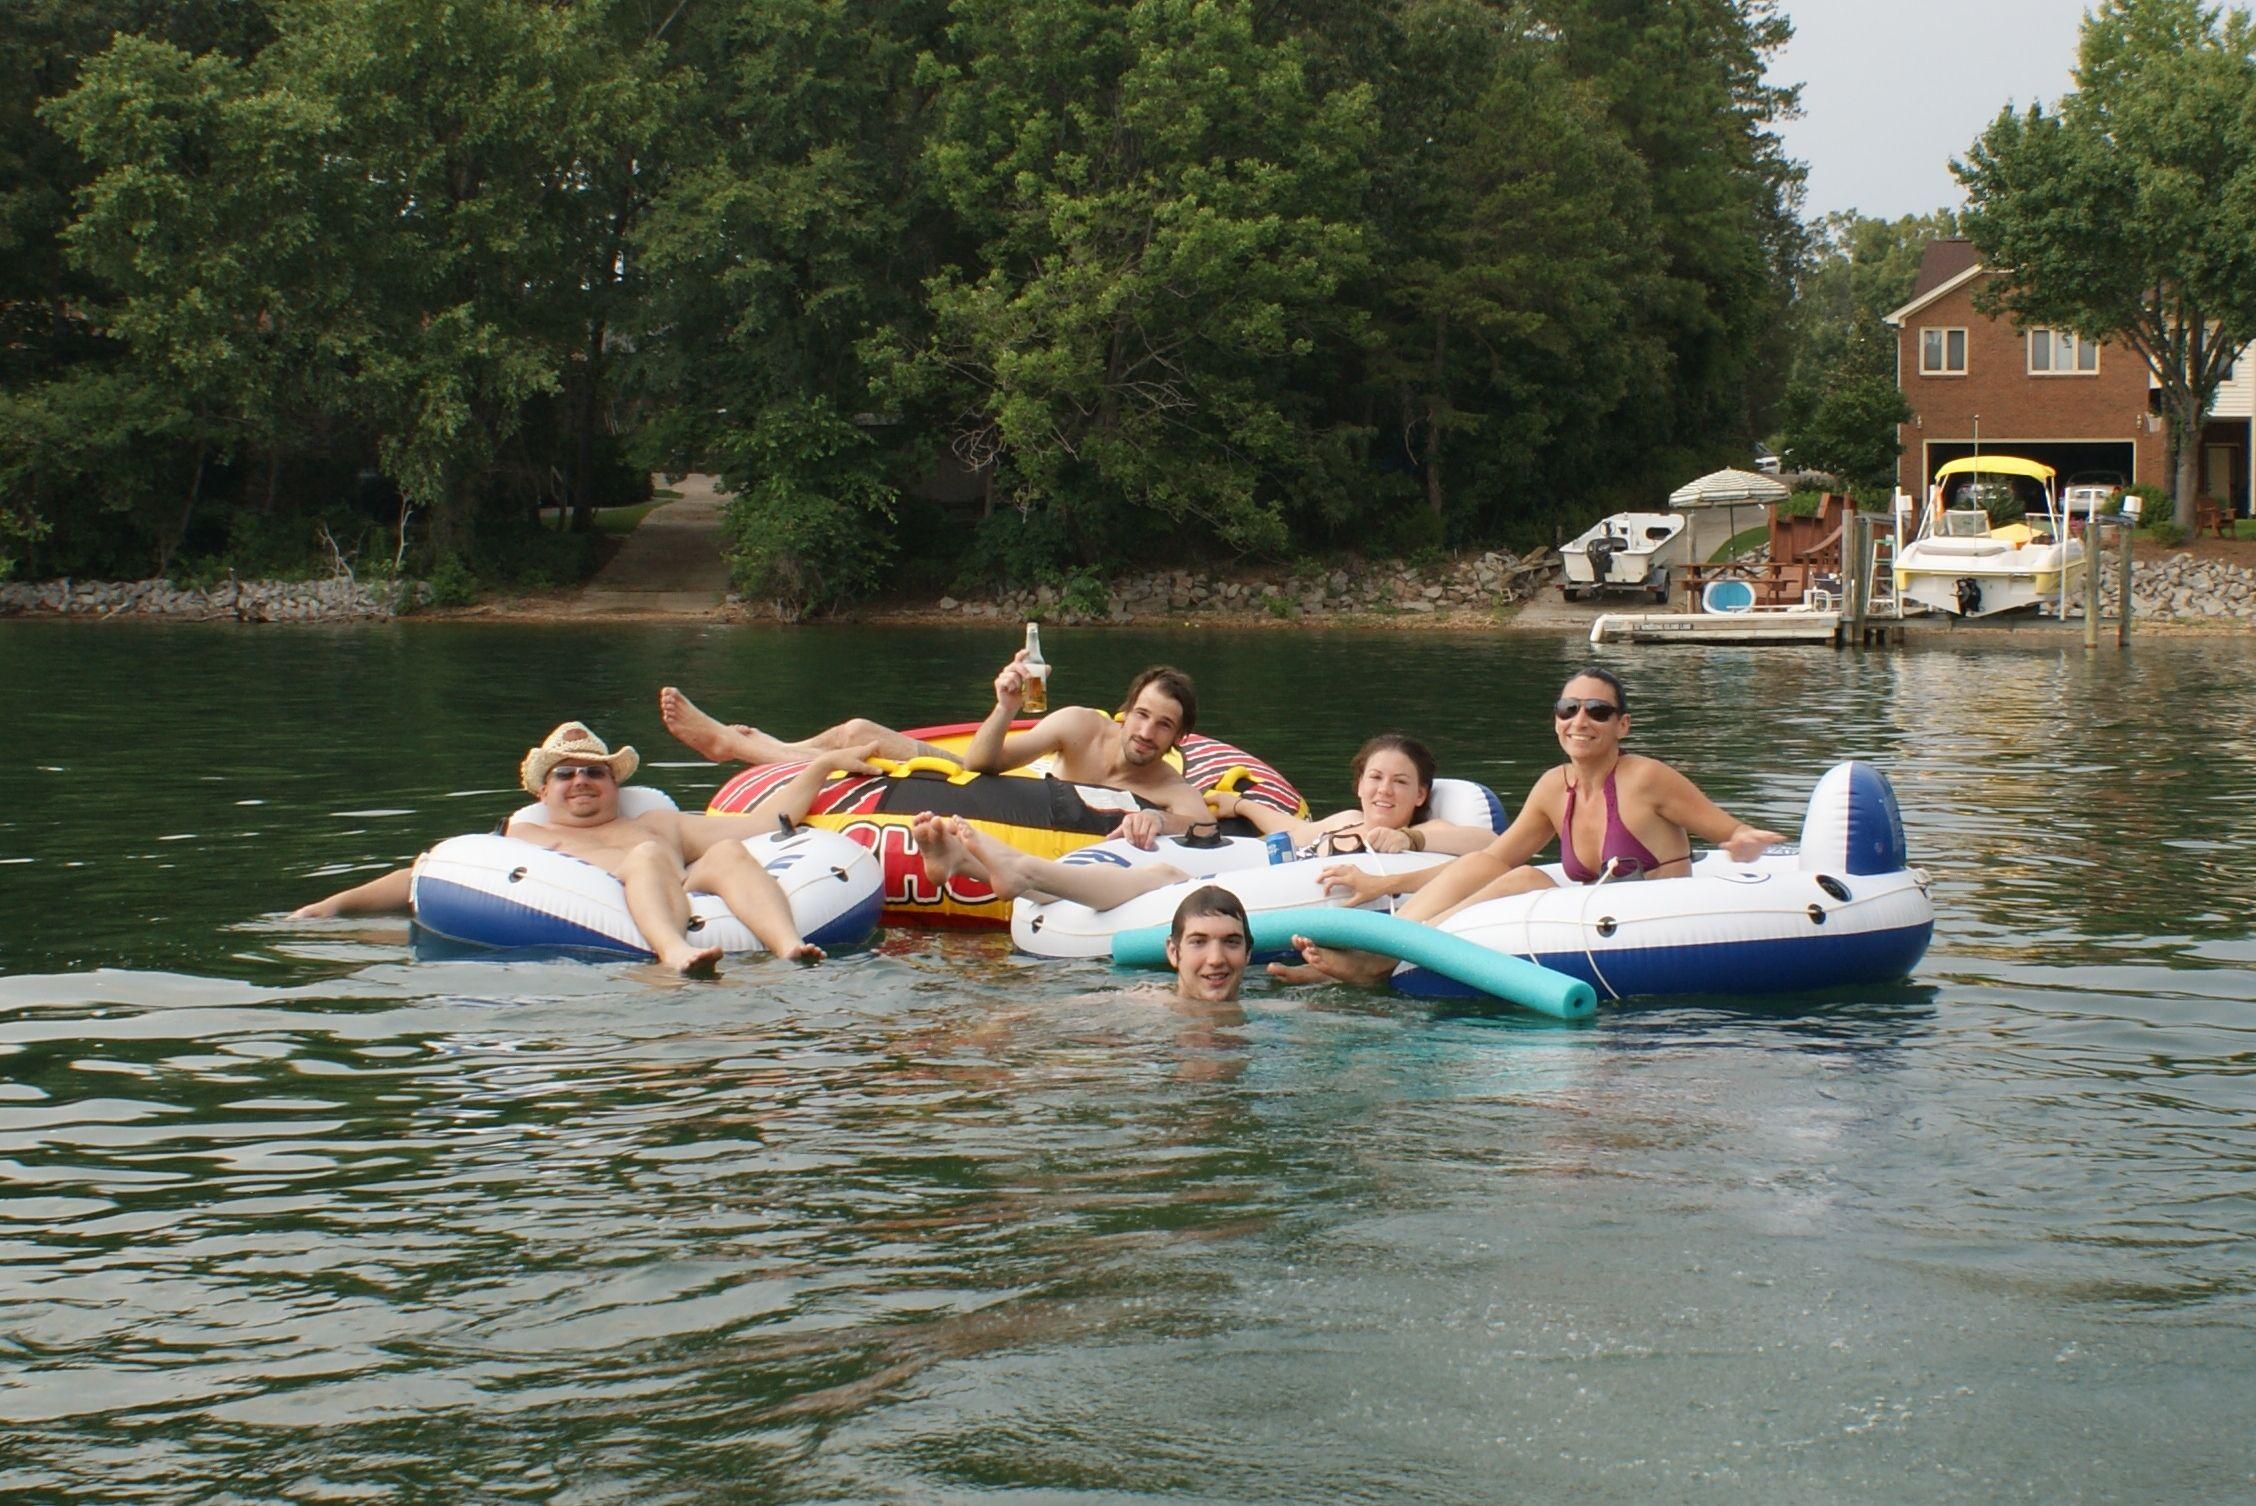 Summer of Totally Tubin 2012 (Lake Murray)